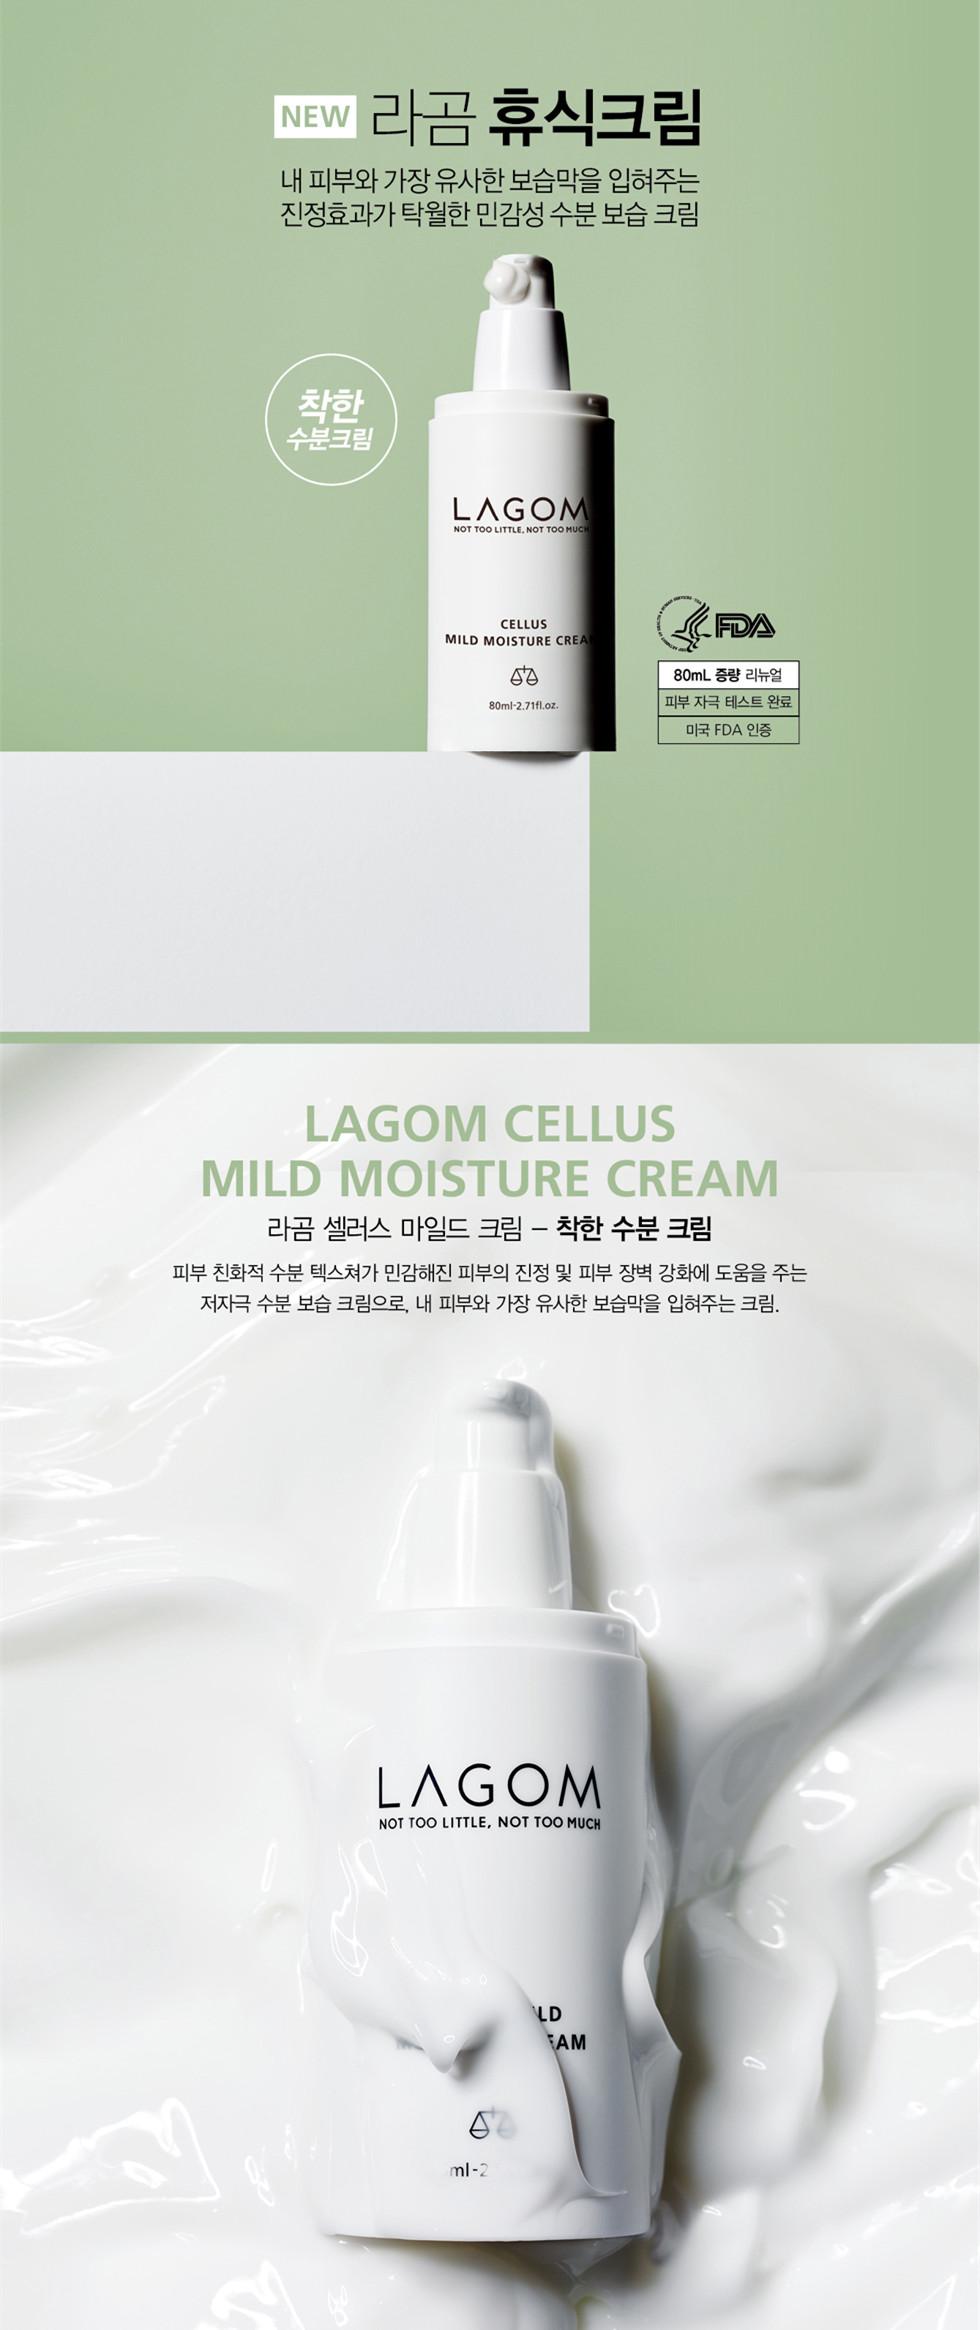 Lagom Cells Mild Moisture Cream 溫和皮膚修復再生保濕面霜